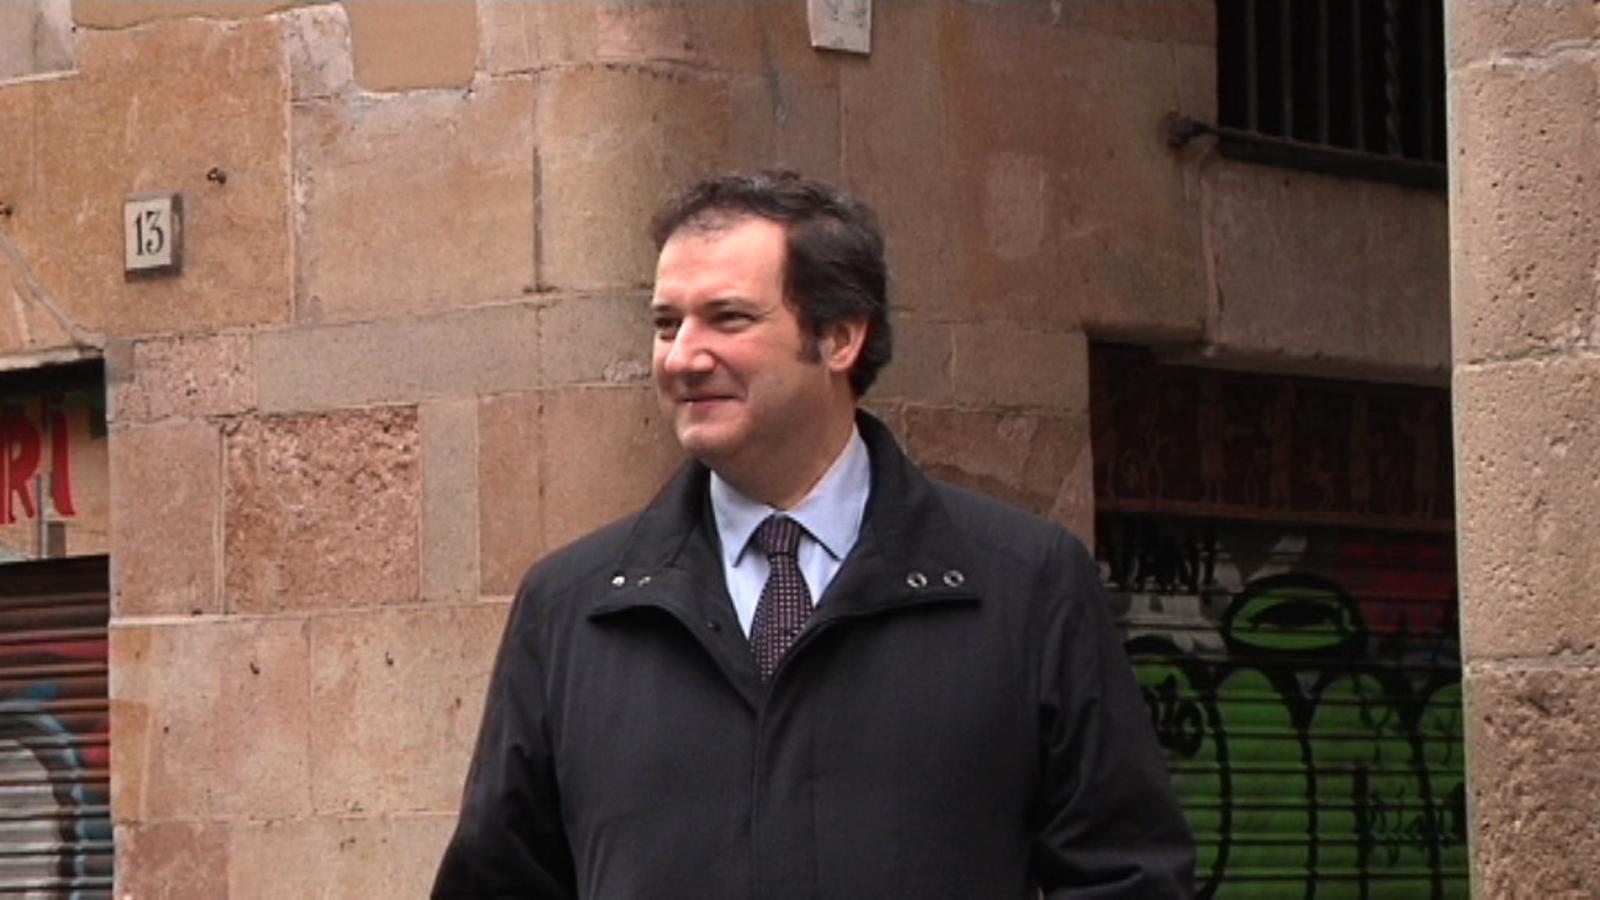 Jordi Hereu: Tura o Trias poden prometre coses, jo ja les he fet